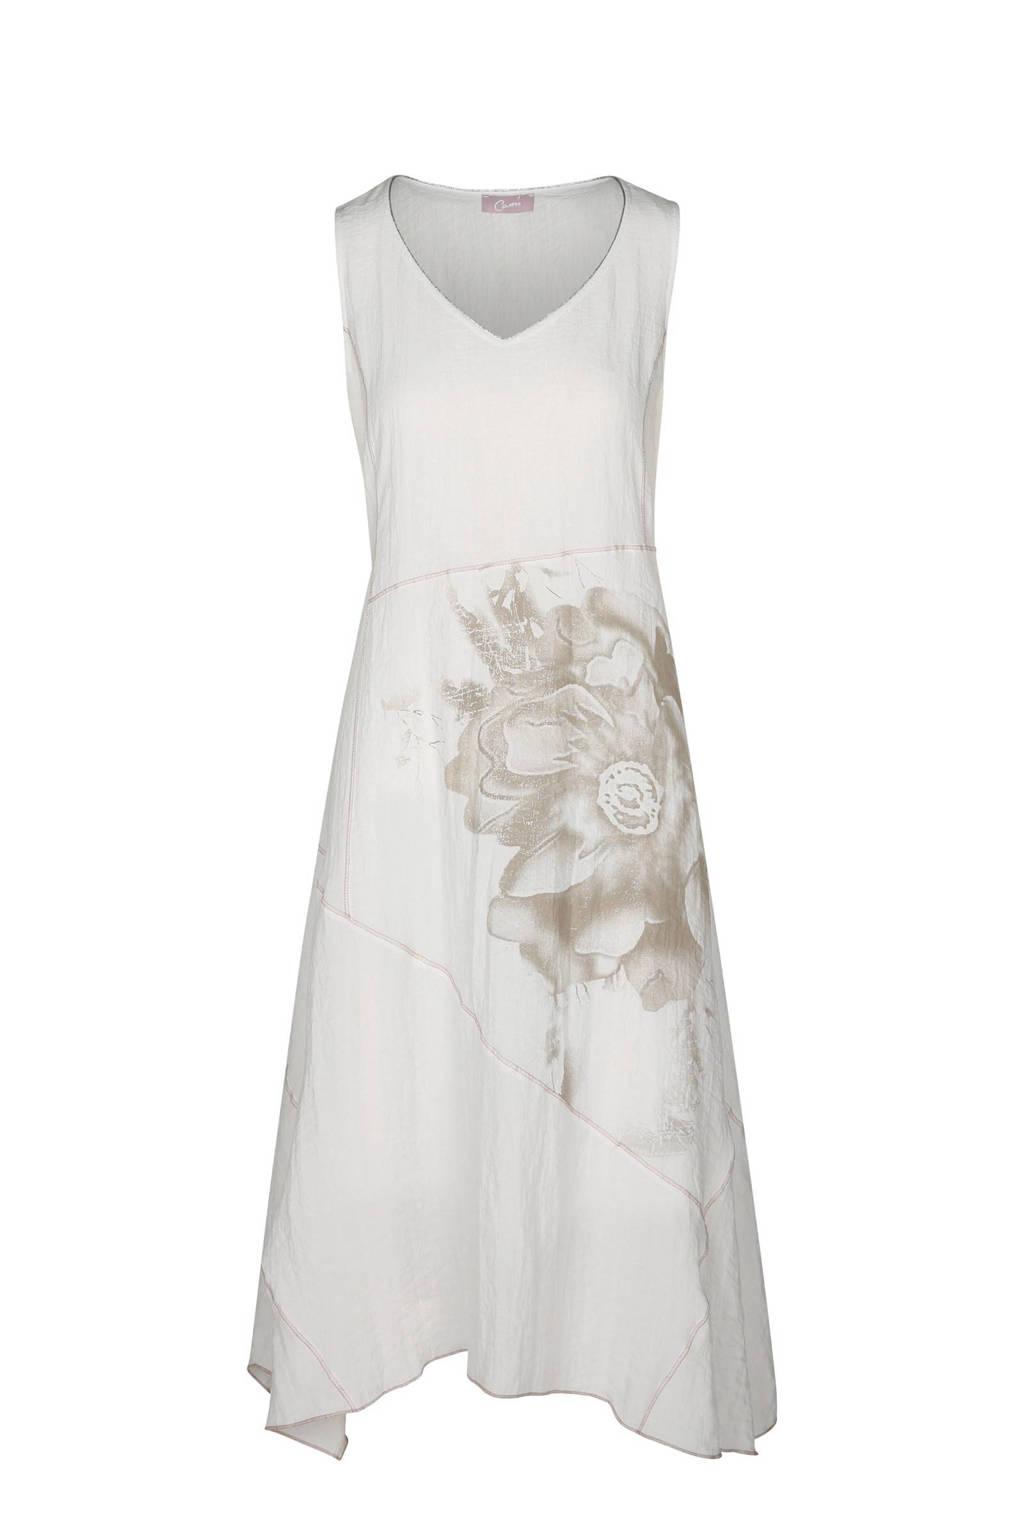 Cassis jurk met bloem opdruk ecru, Ecru/beige